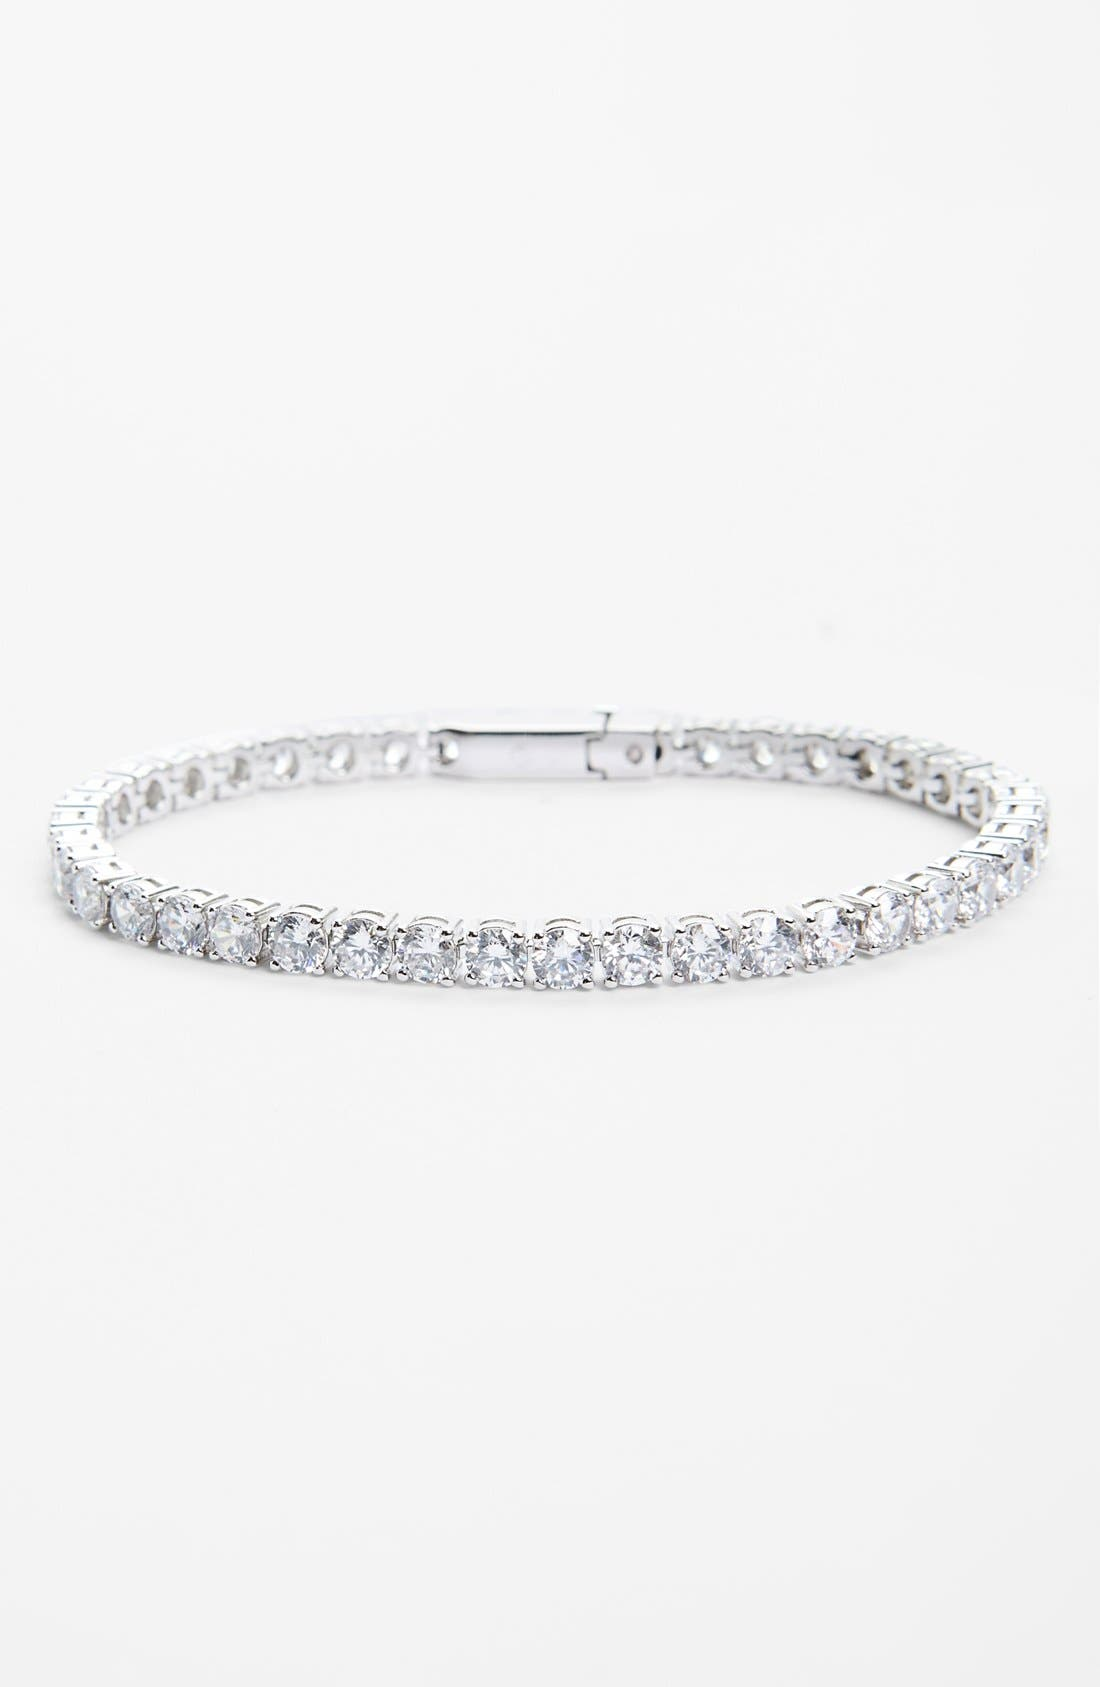 Main Image - Nadri Cubic Zirconia Tennis Bracelet